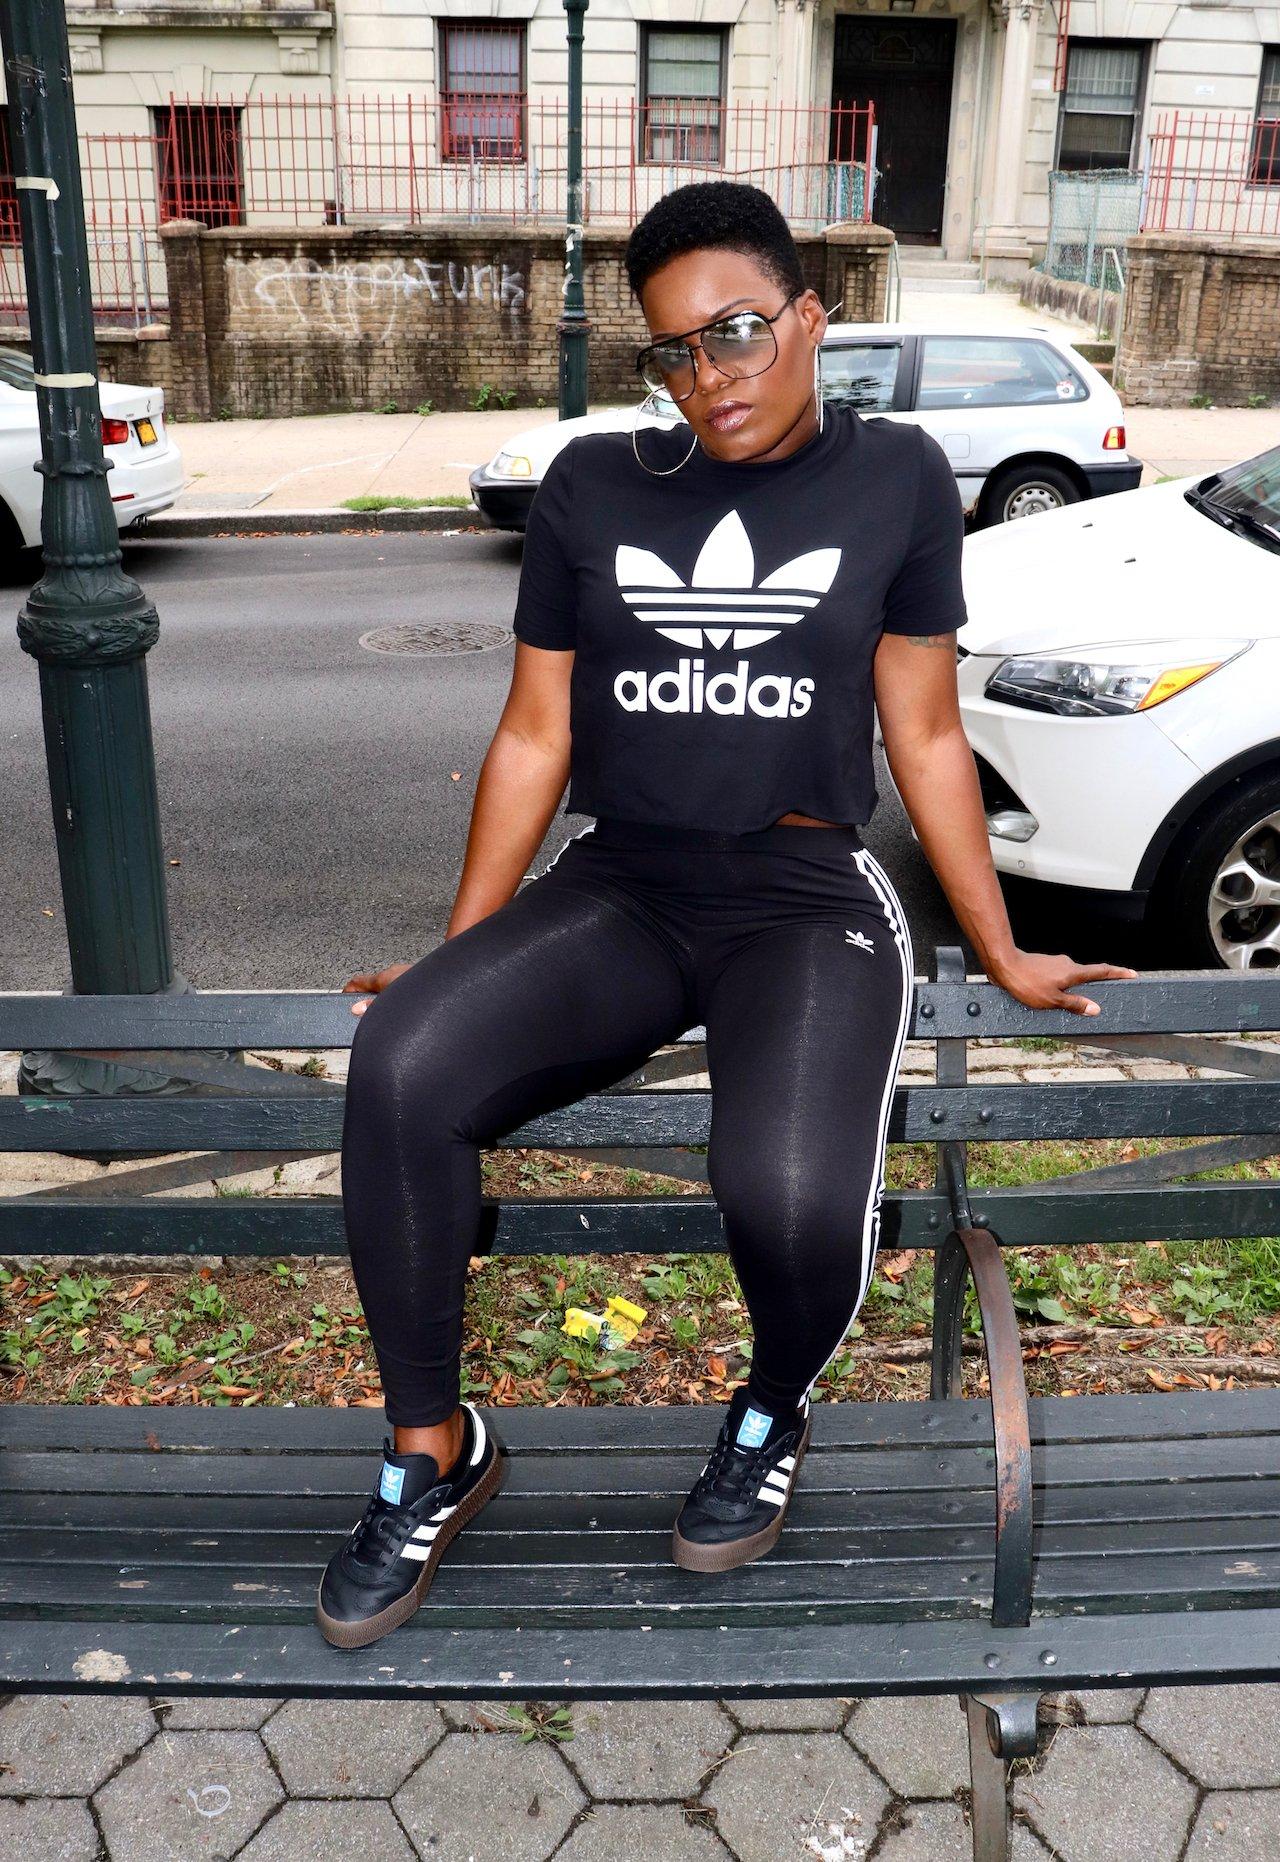 Adidas 3 Stripe Leggings, Trefoil Tee and Samba Rose Sneakers